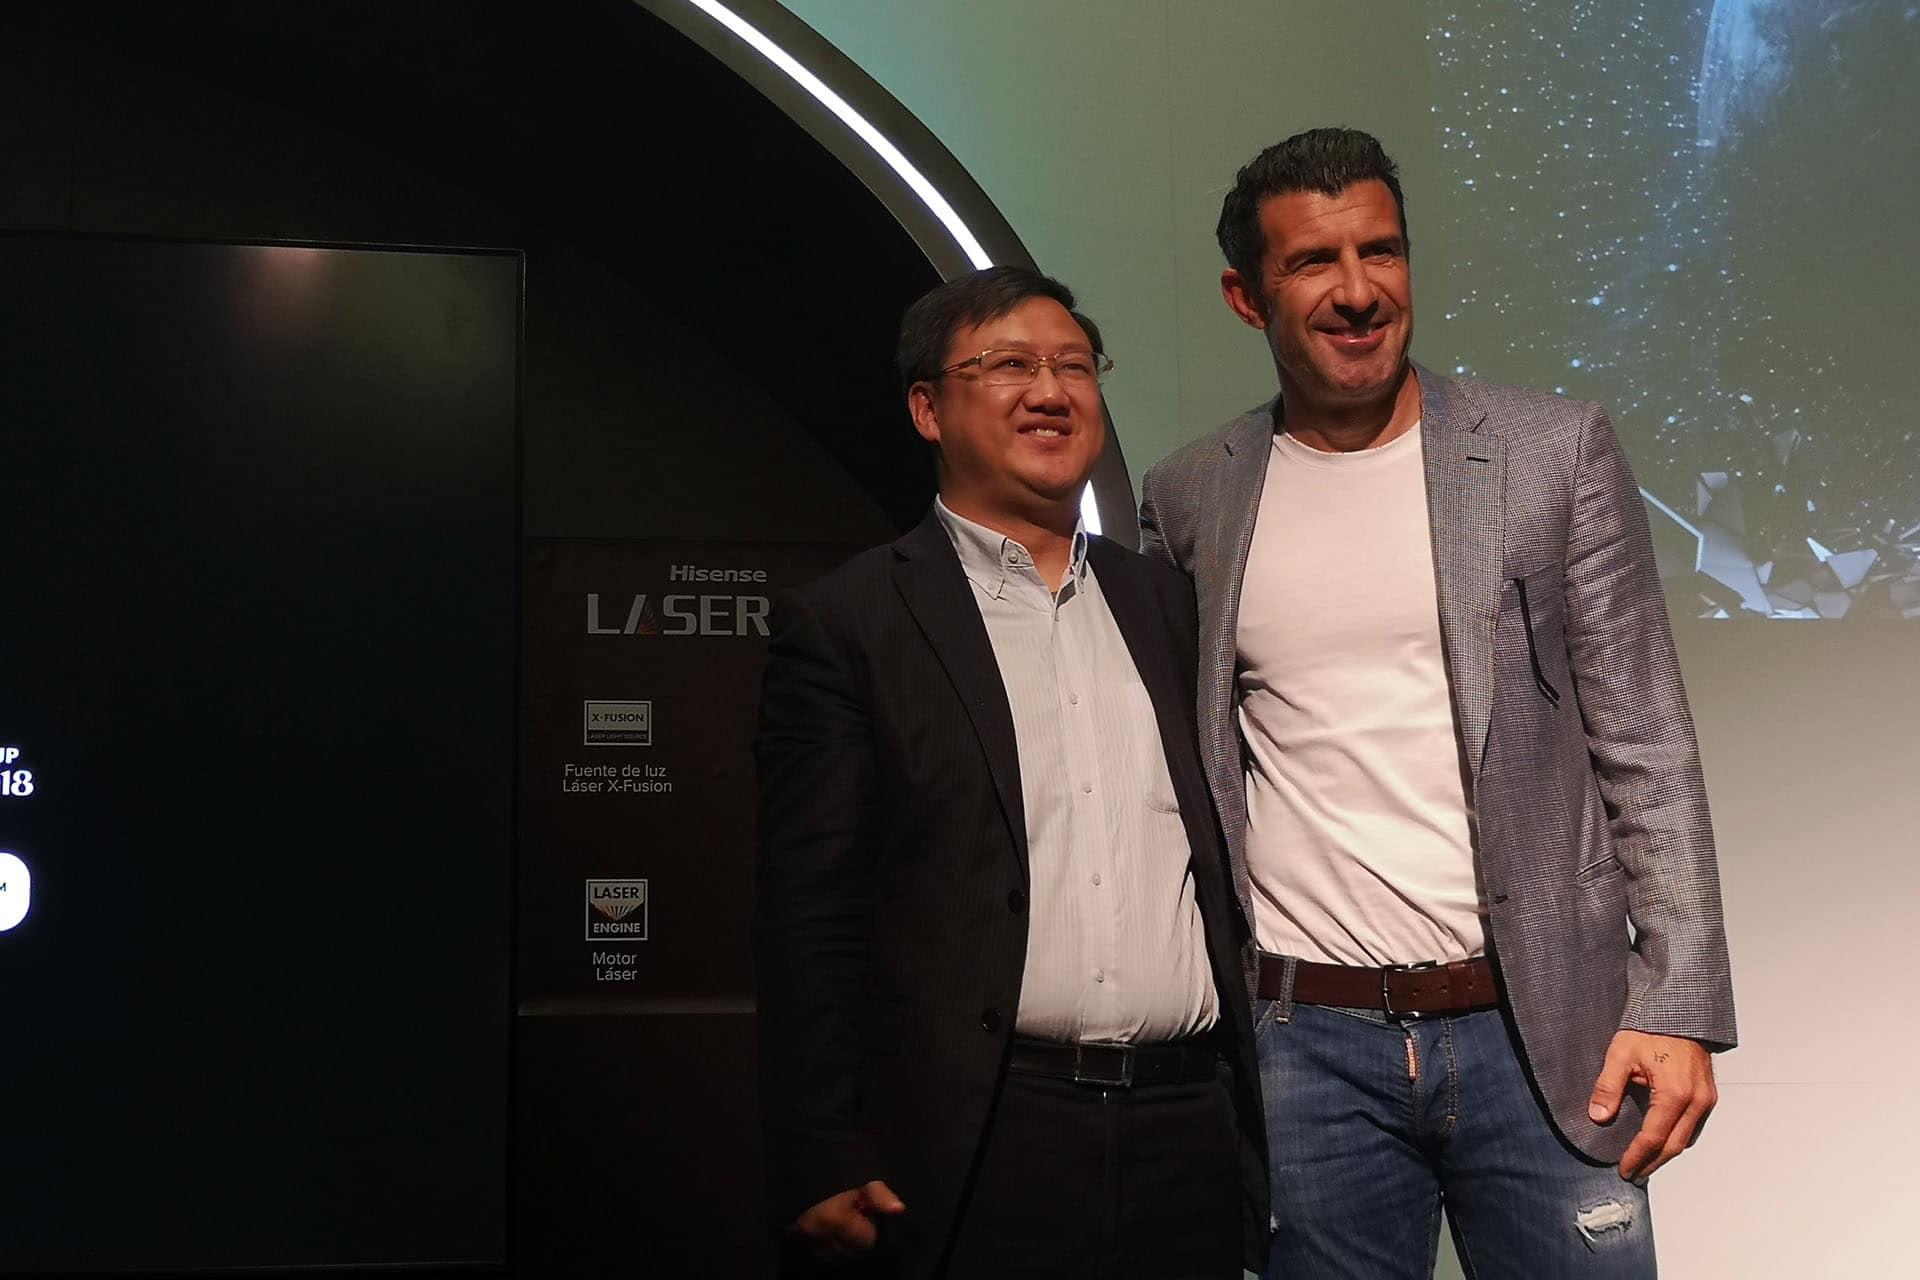 hisense lança laser tv de 100 polegadas - Hisense Laser TV 05 - Hisense lança Laser TV de 100 polegadas